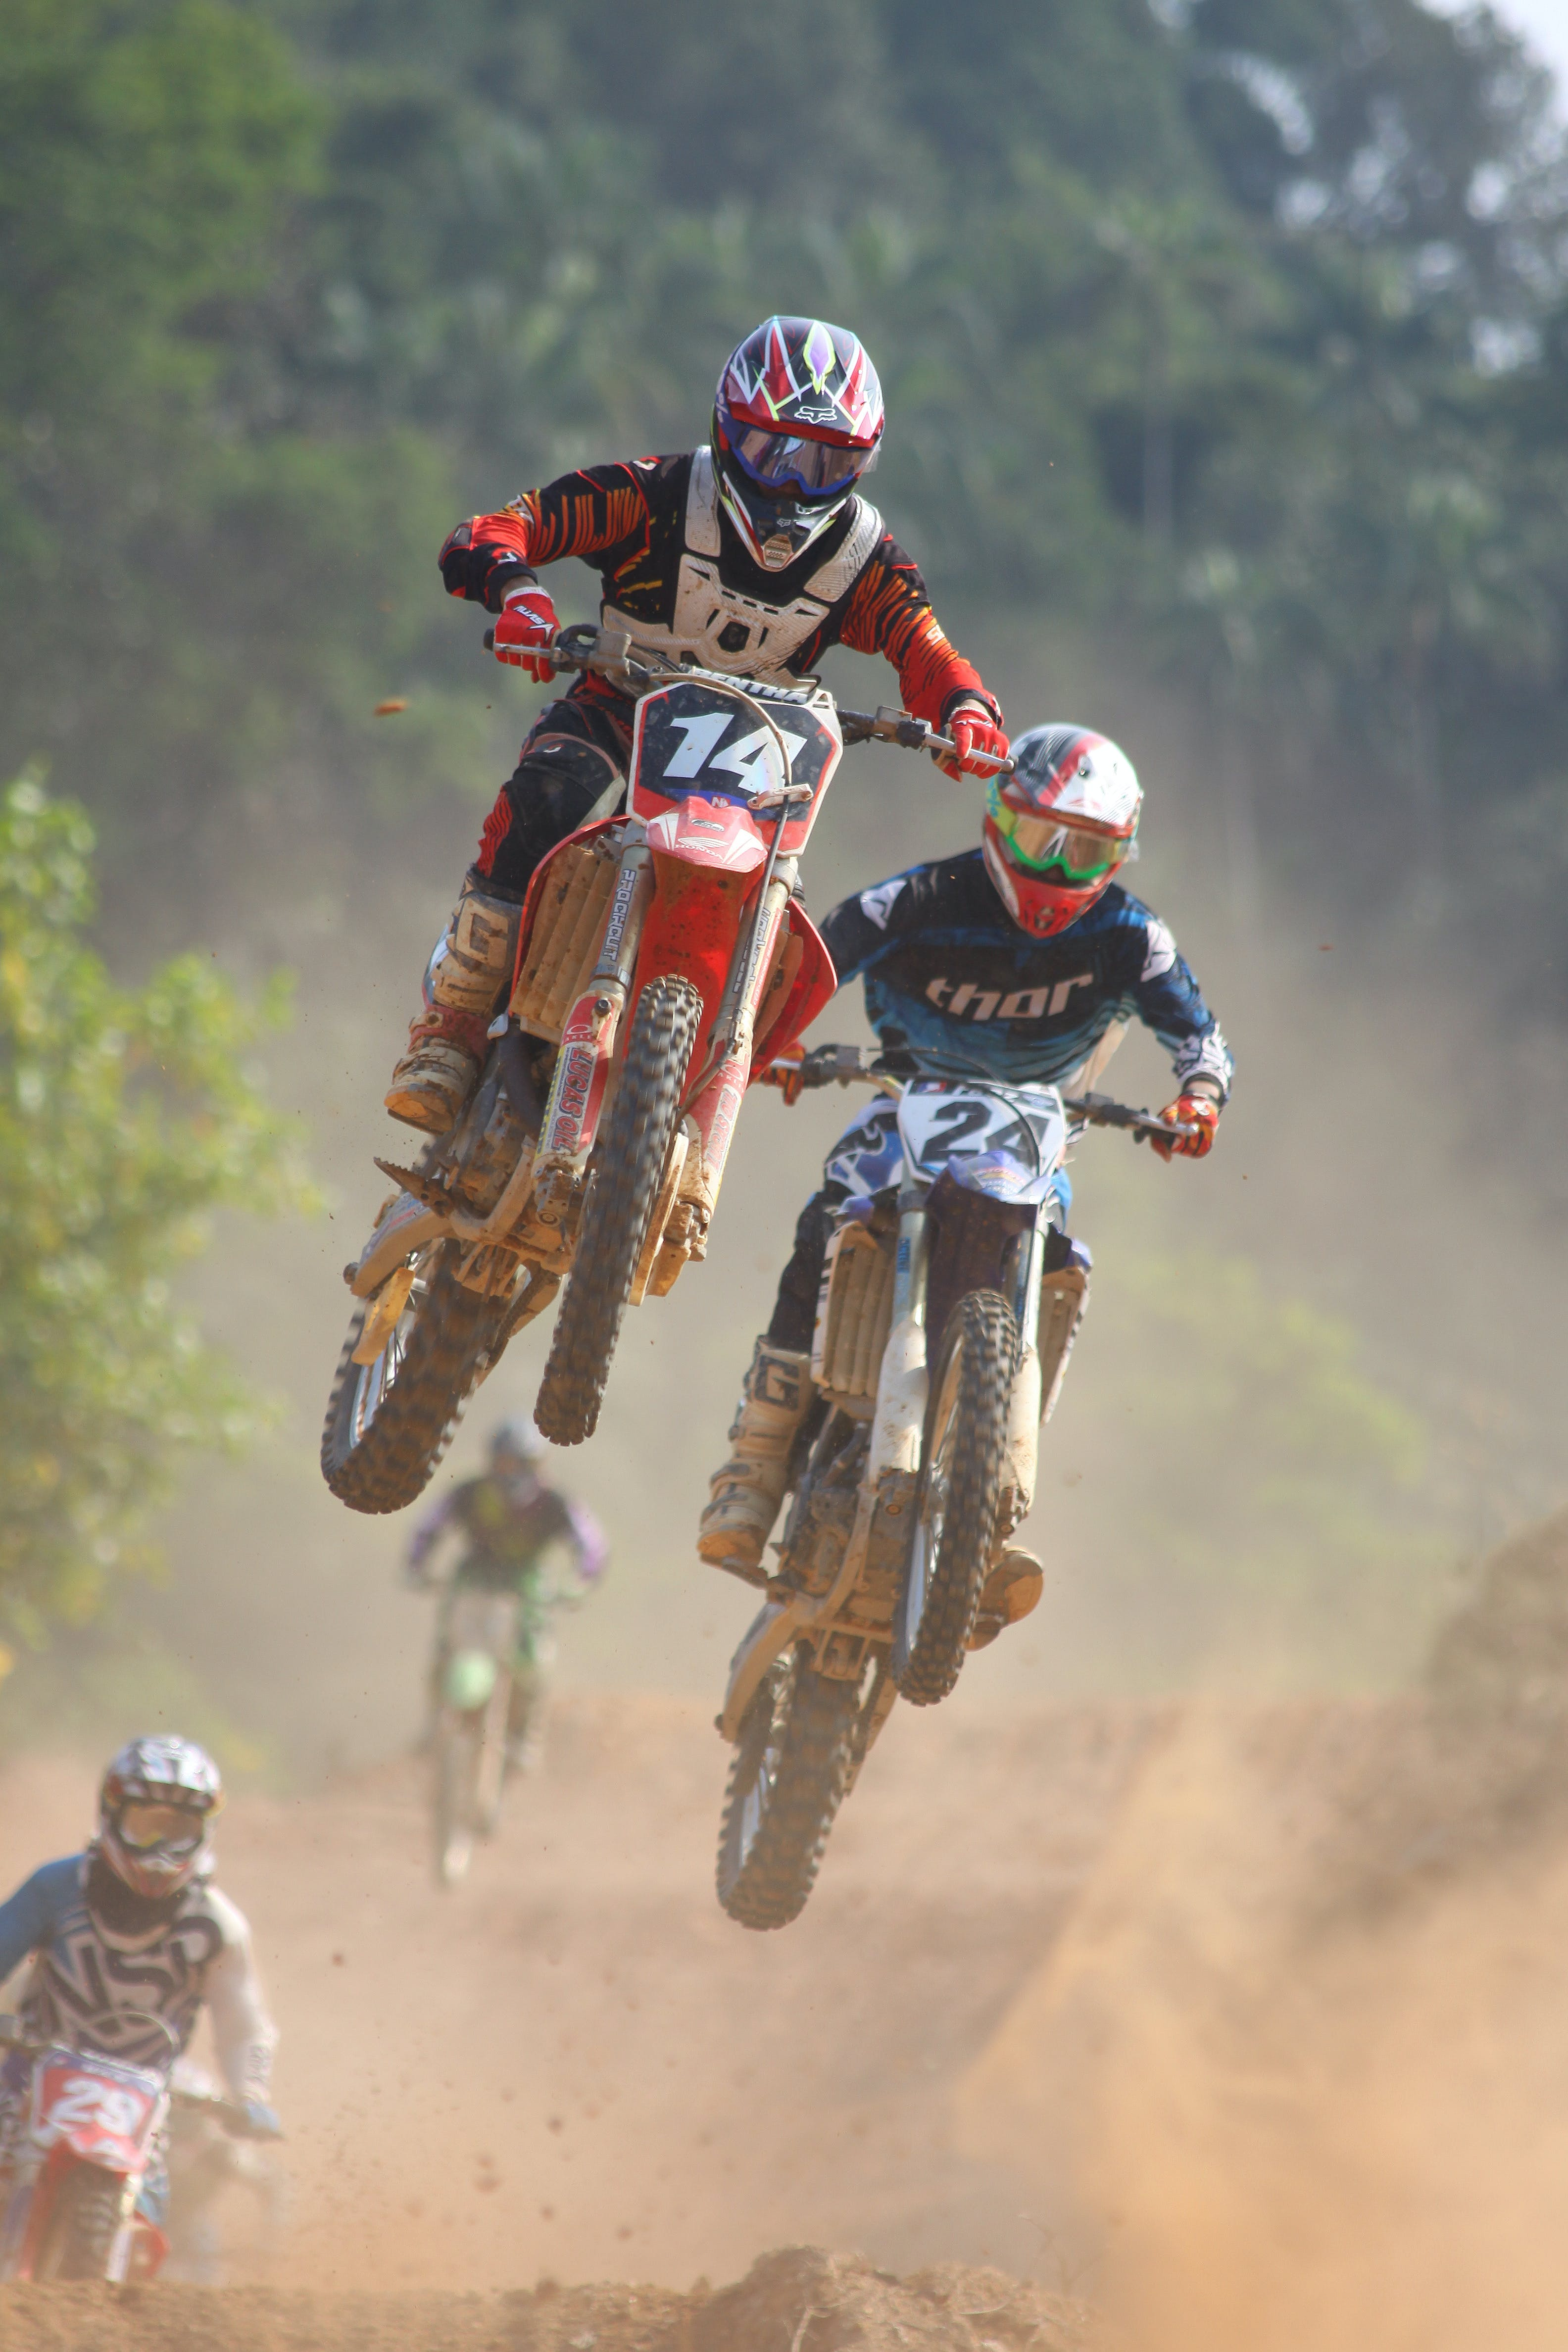 Kostenloses Stock Foto zu abenteuer, dirt bikes, fahrzeuge, helme